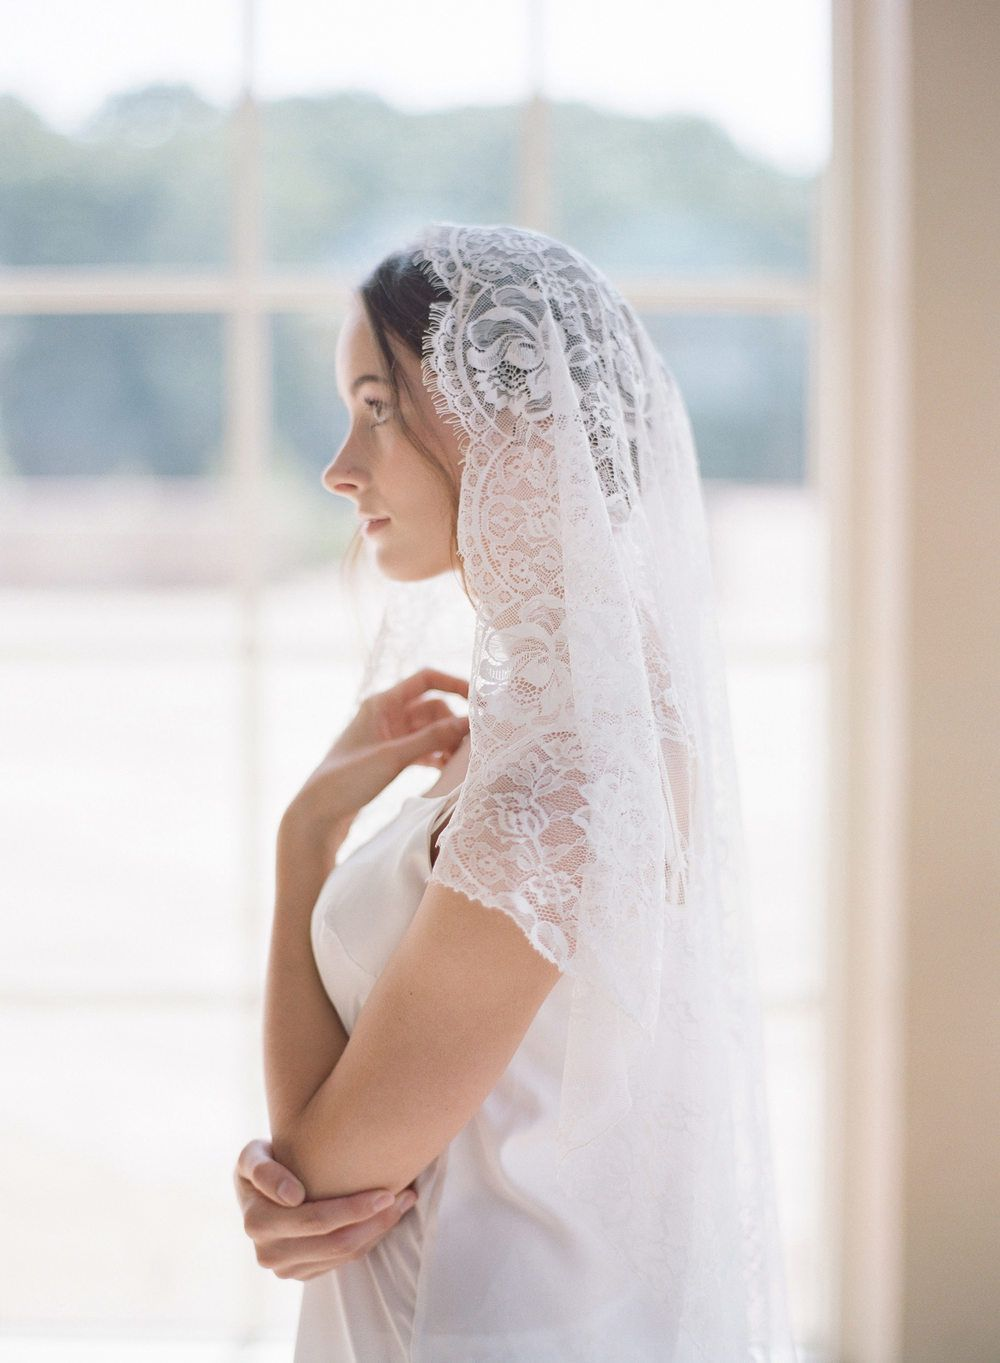 Feminine french bridal fashion shoot veils flower crowns halos